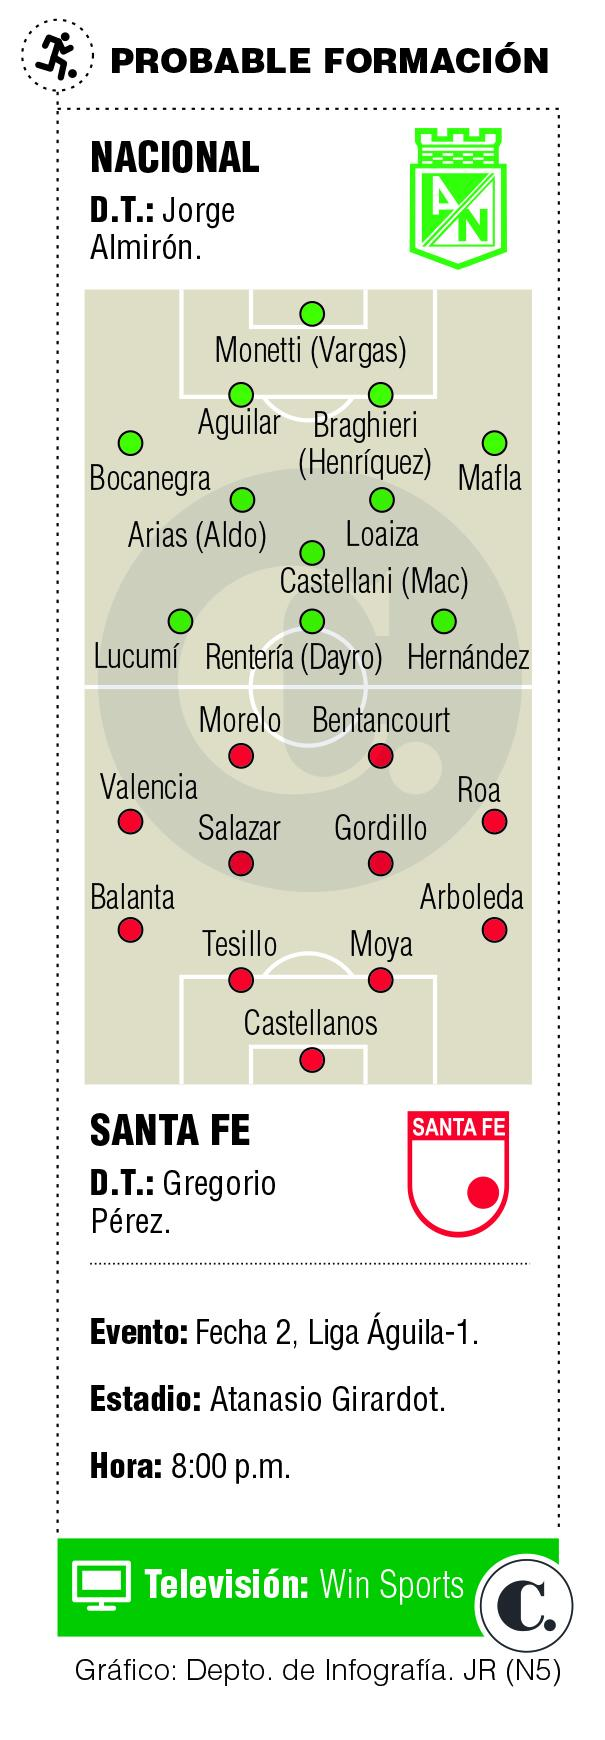 Duelo Nacional-Santa Fe en la Liga Águila